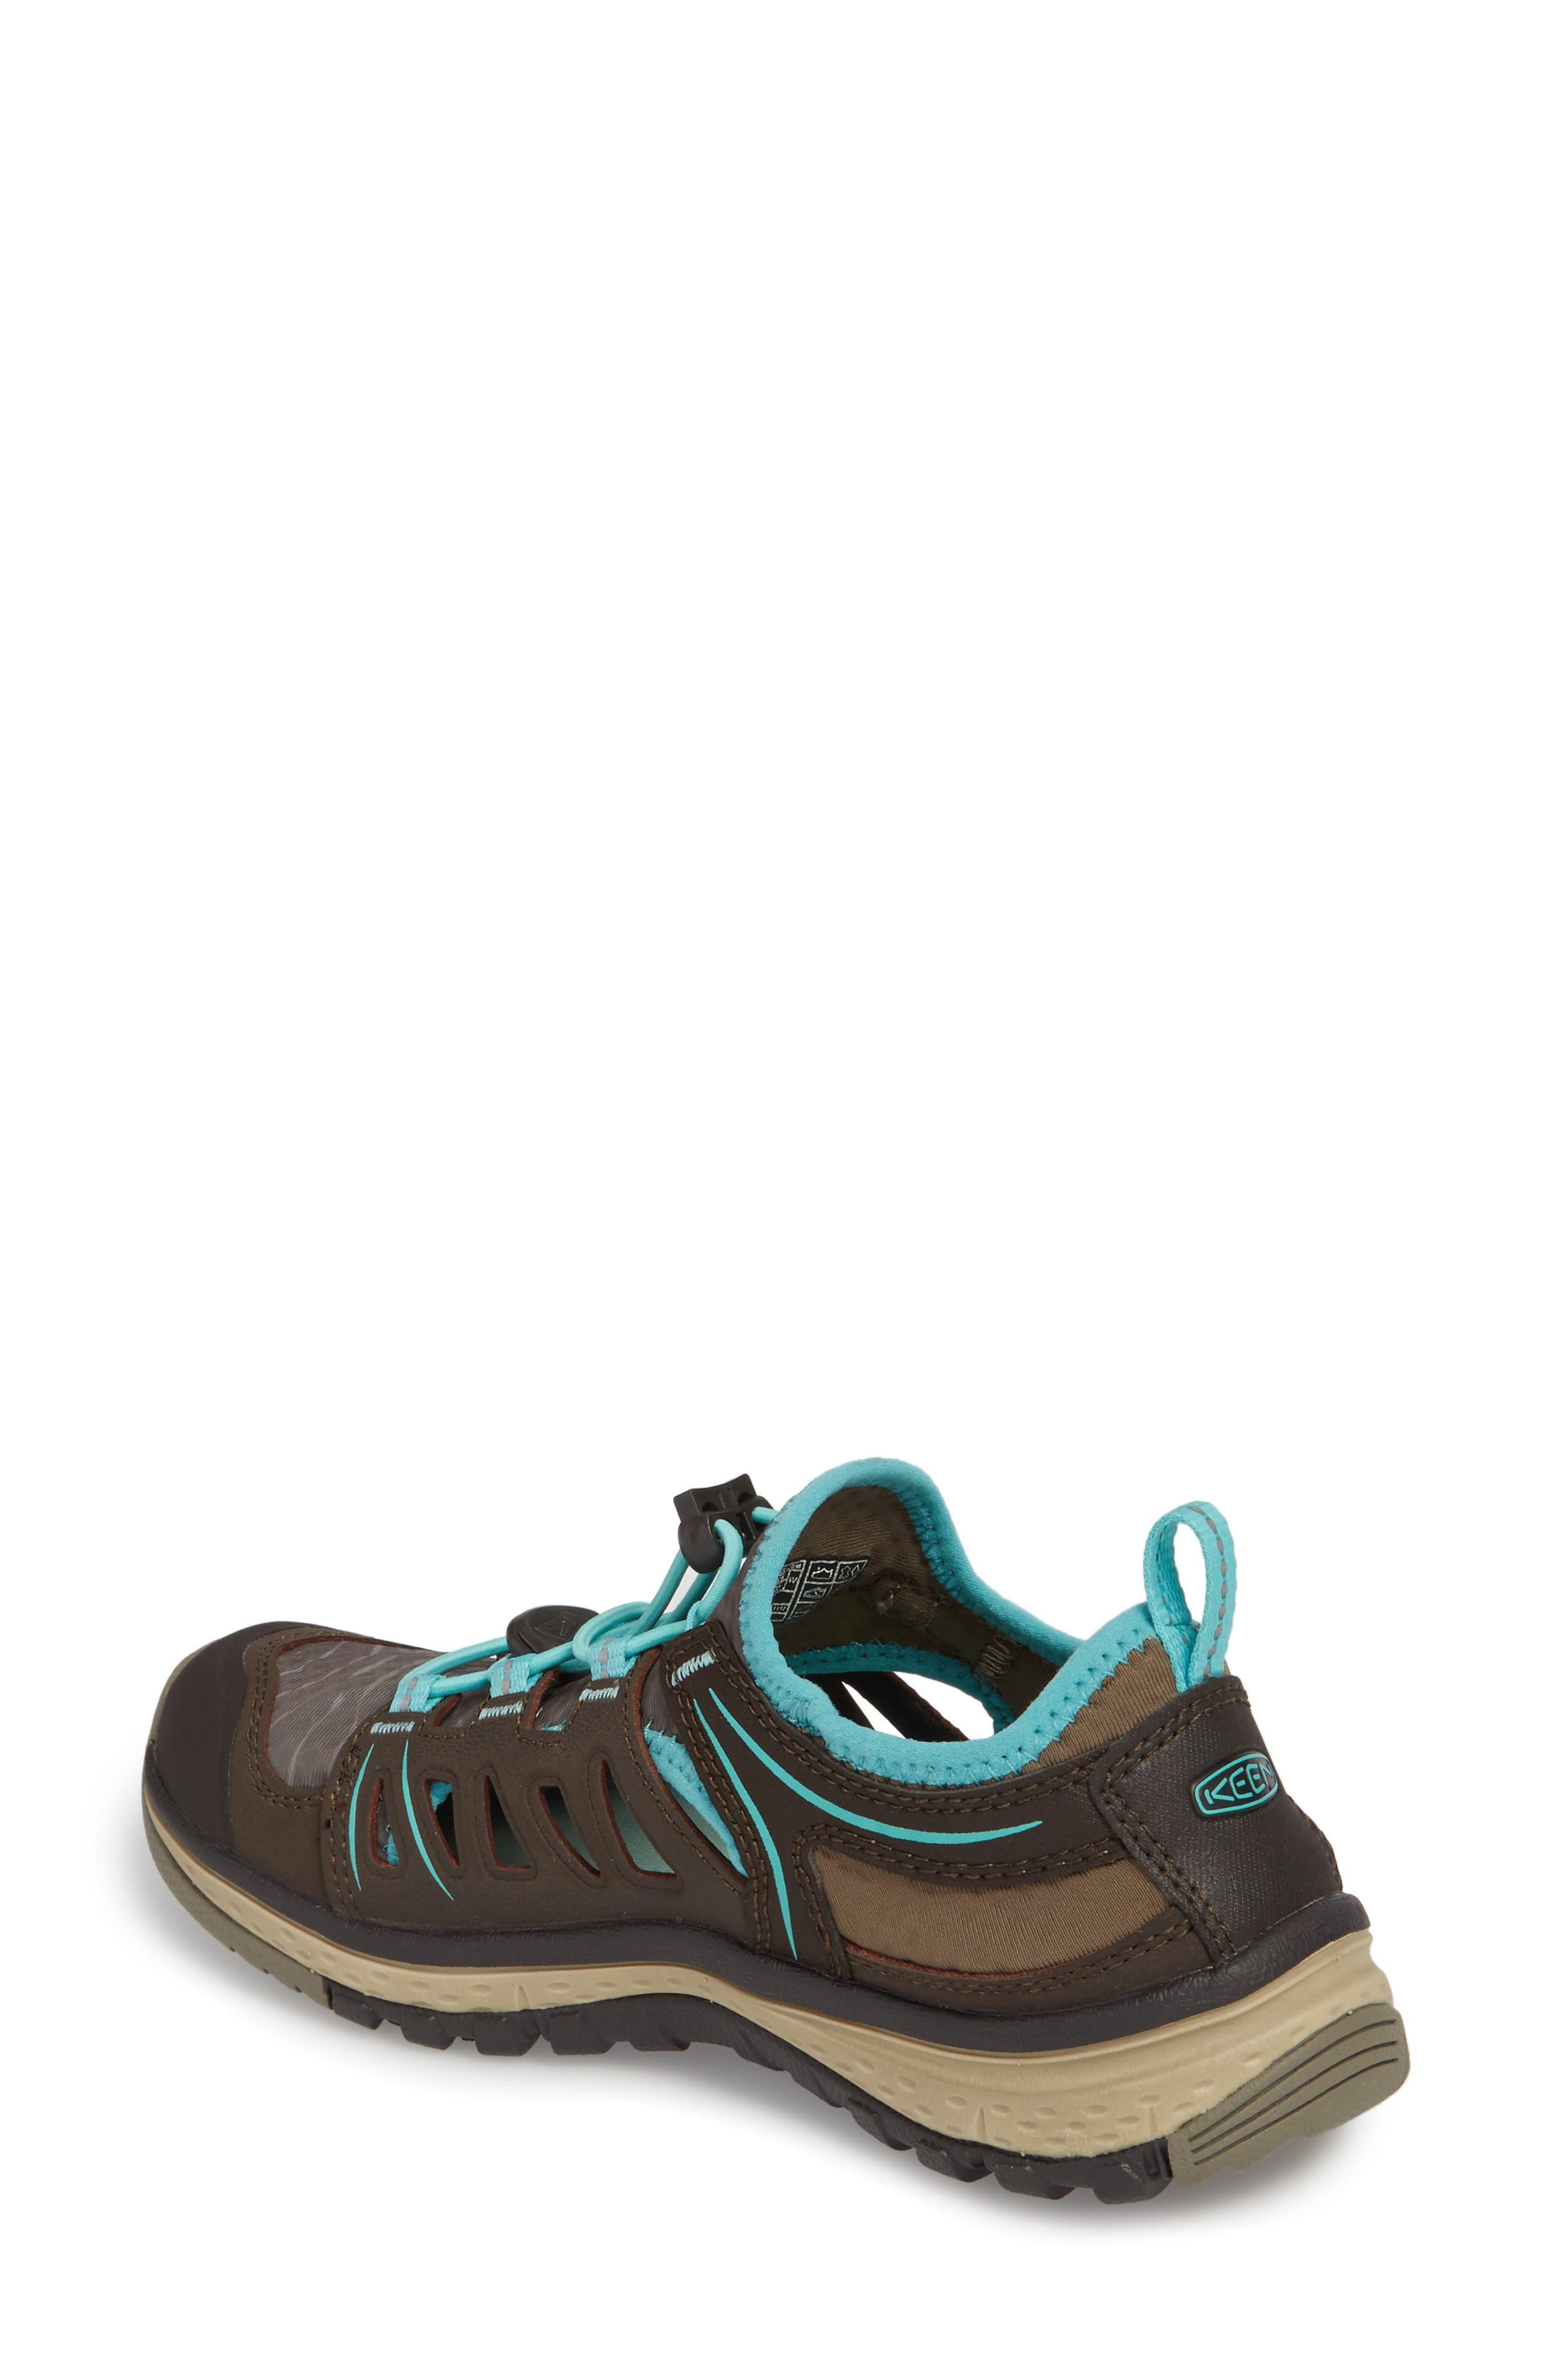 Terradora Ethos Hiking Sneaker,                             Alternate thumbnail 5, color,